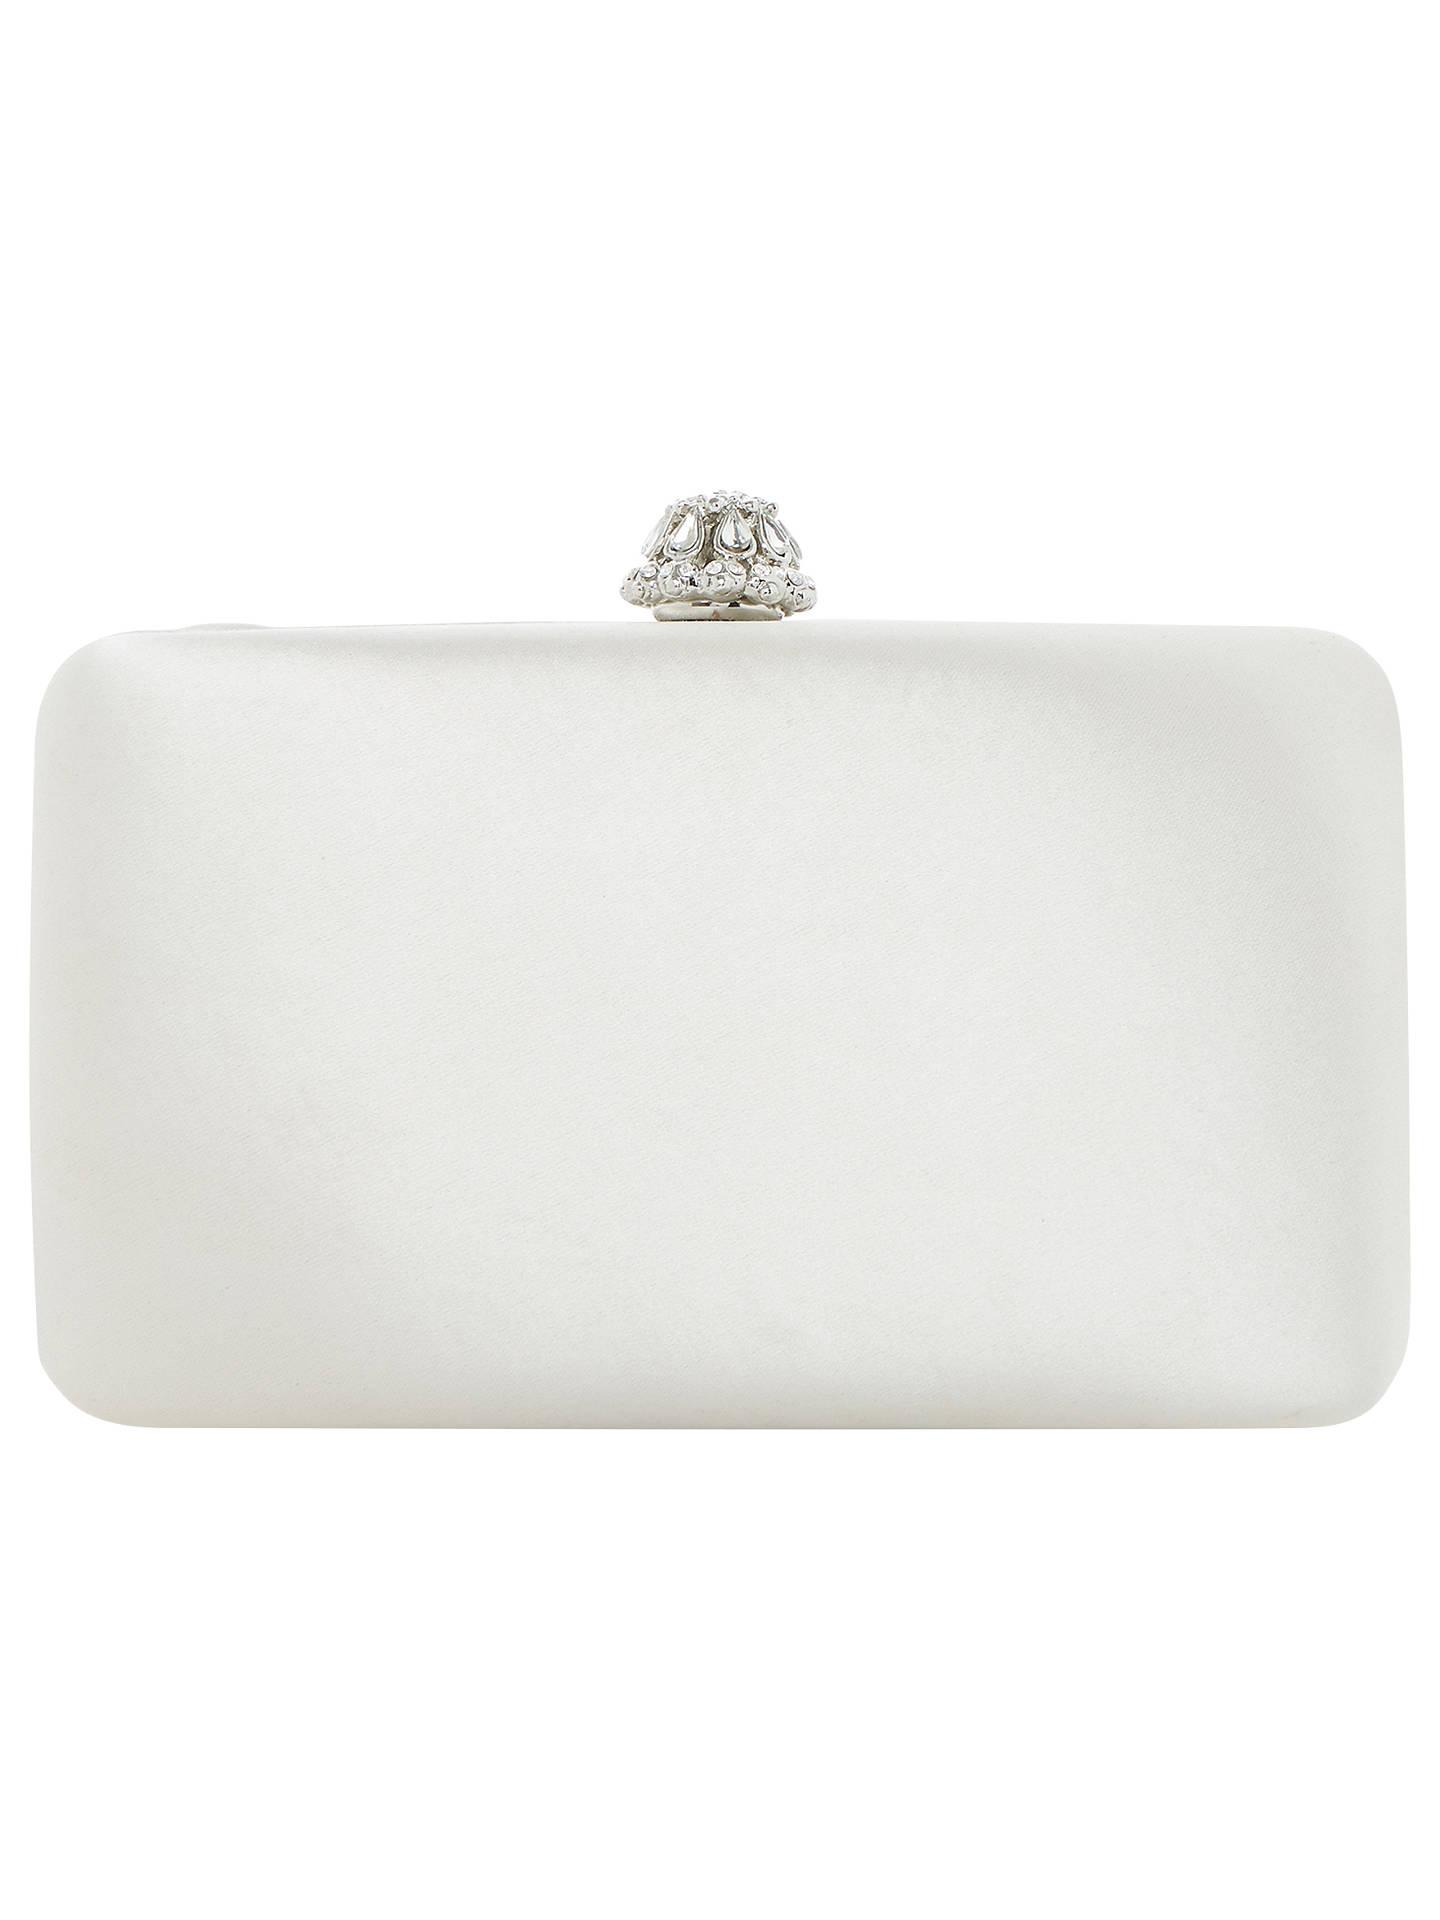 389e286fb7a Dune Bridal Collection Bridey Satin Match Clutch Bag, Ivory